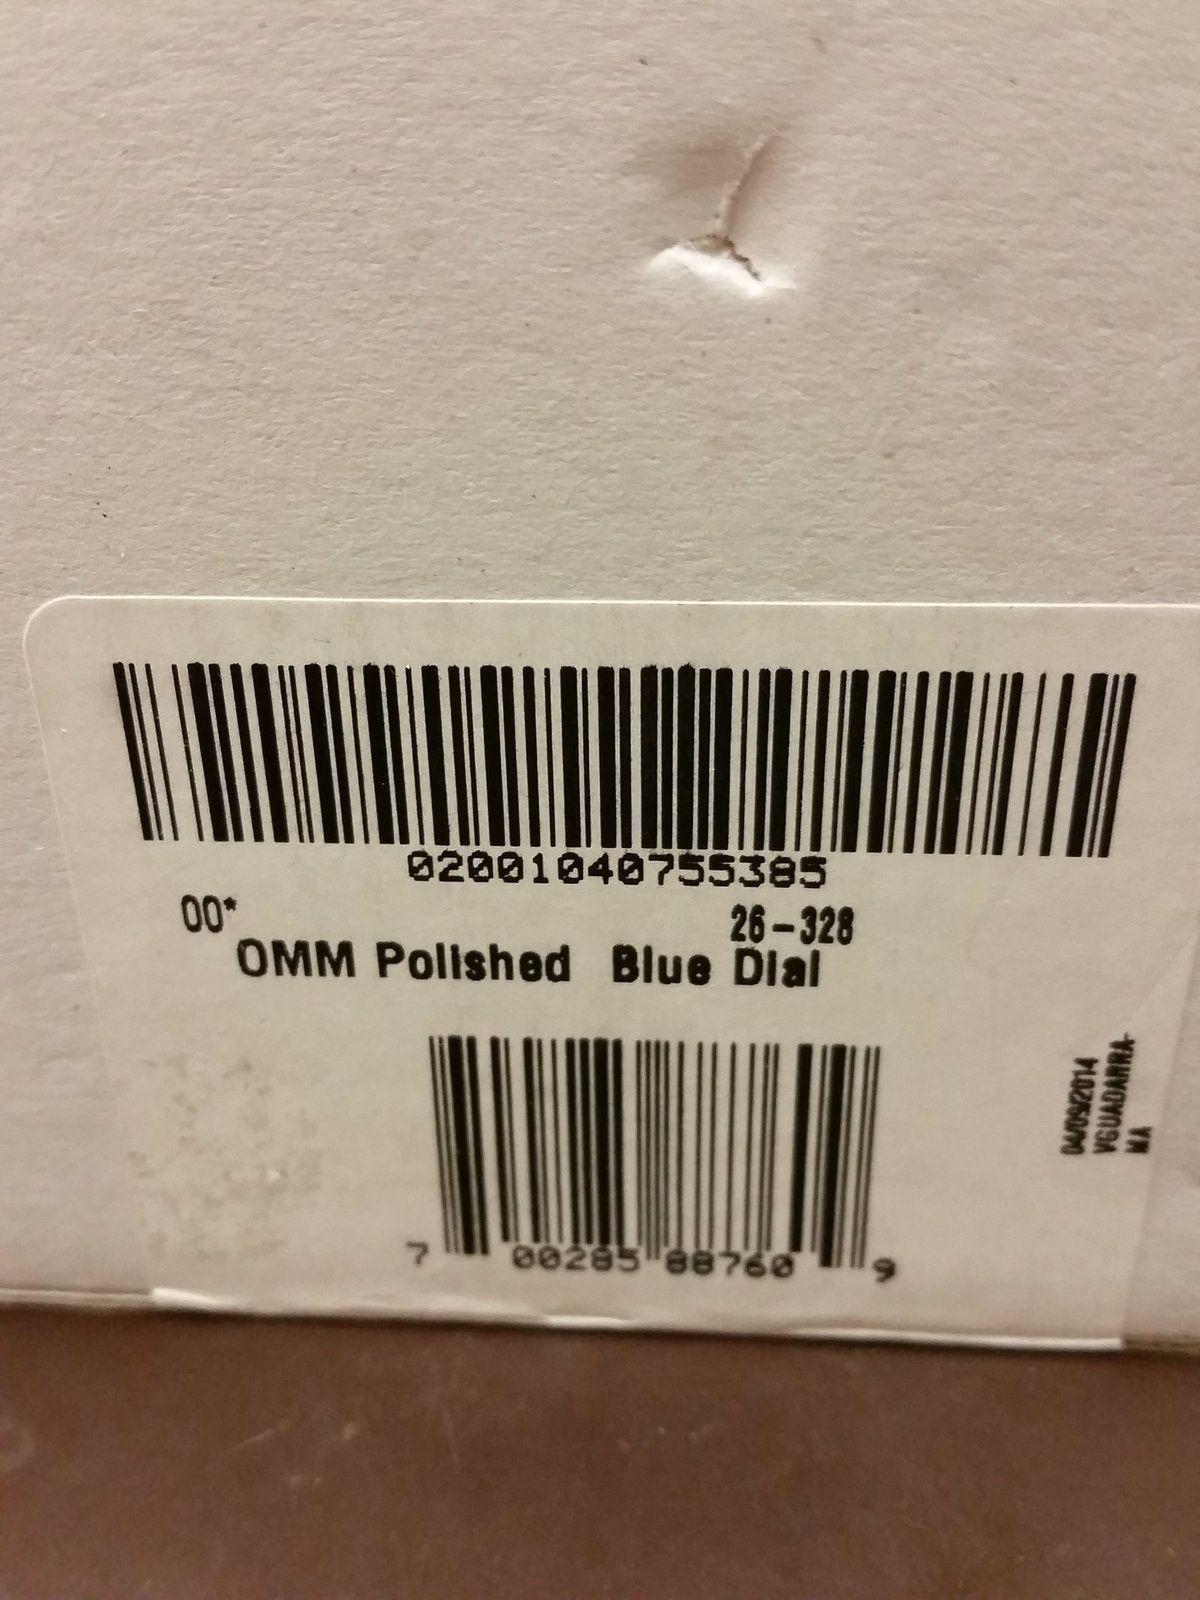 BNIB Polished MM's Blue and Black - 20150930_114241.jpg